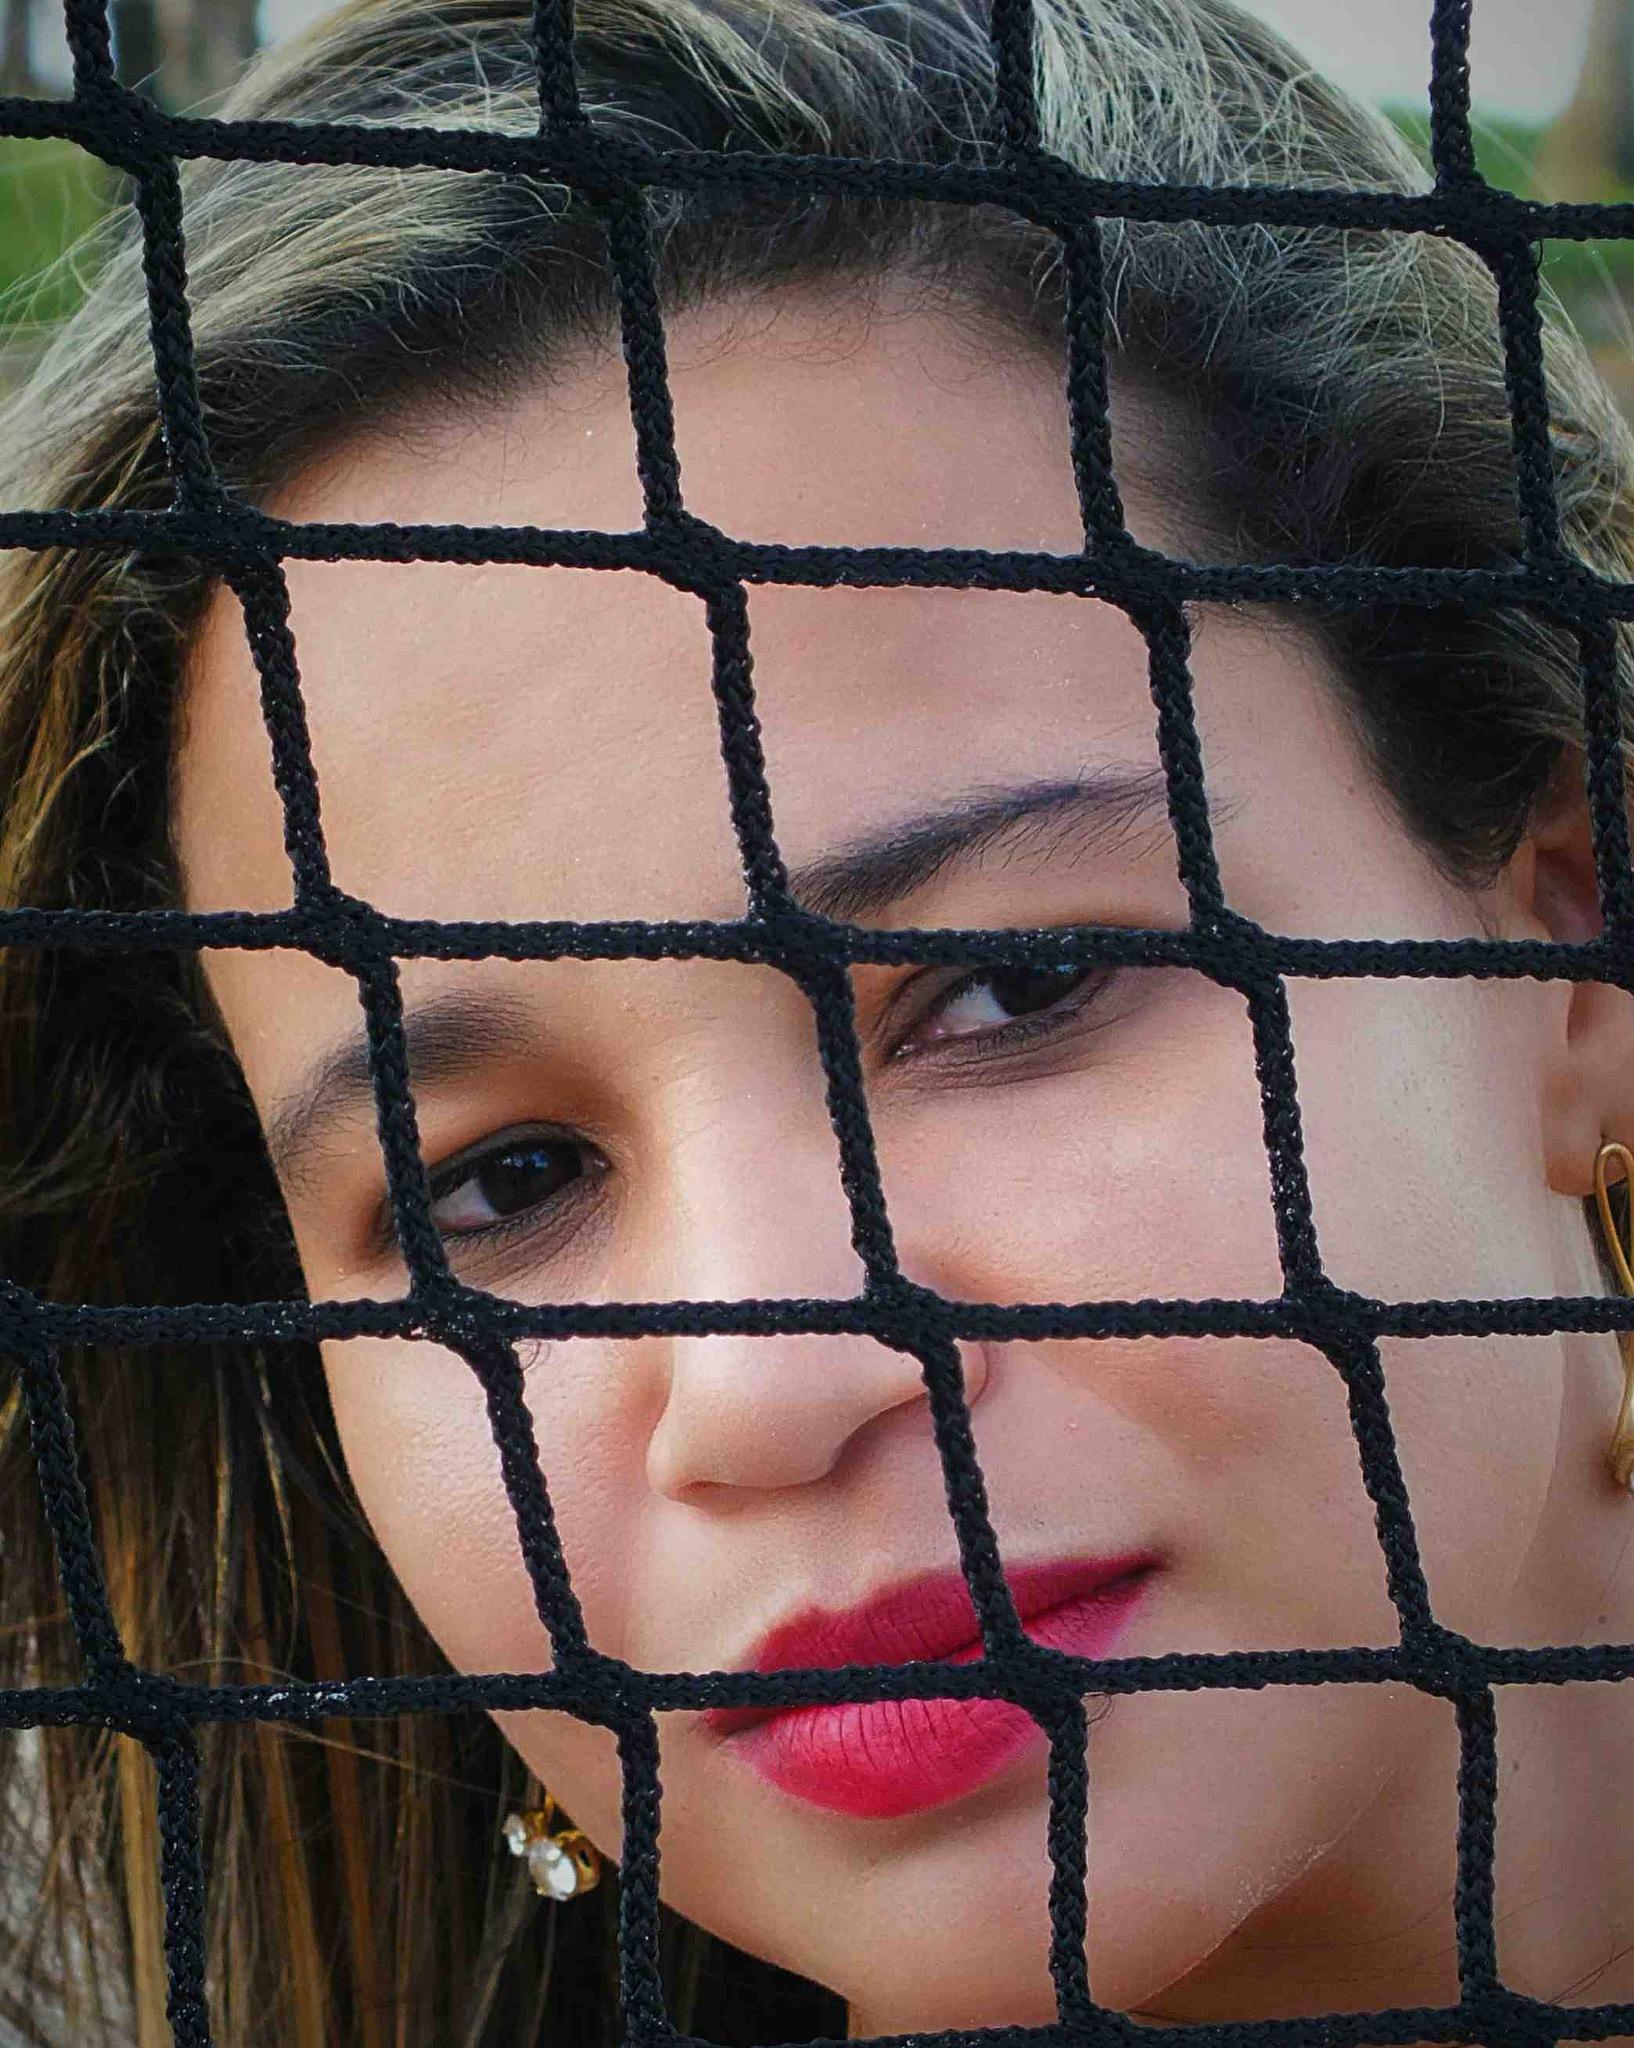 Face by Marco Antonio Oliveira Maron